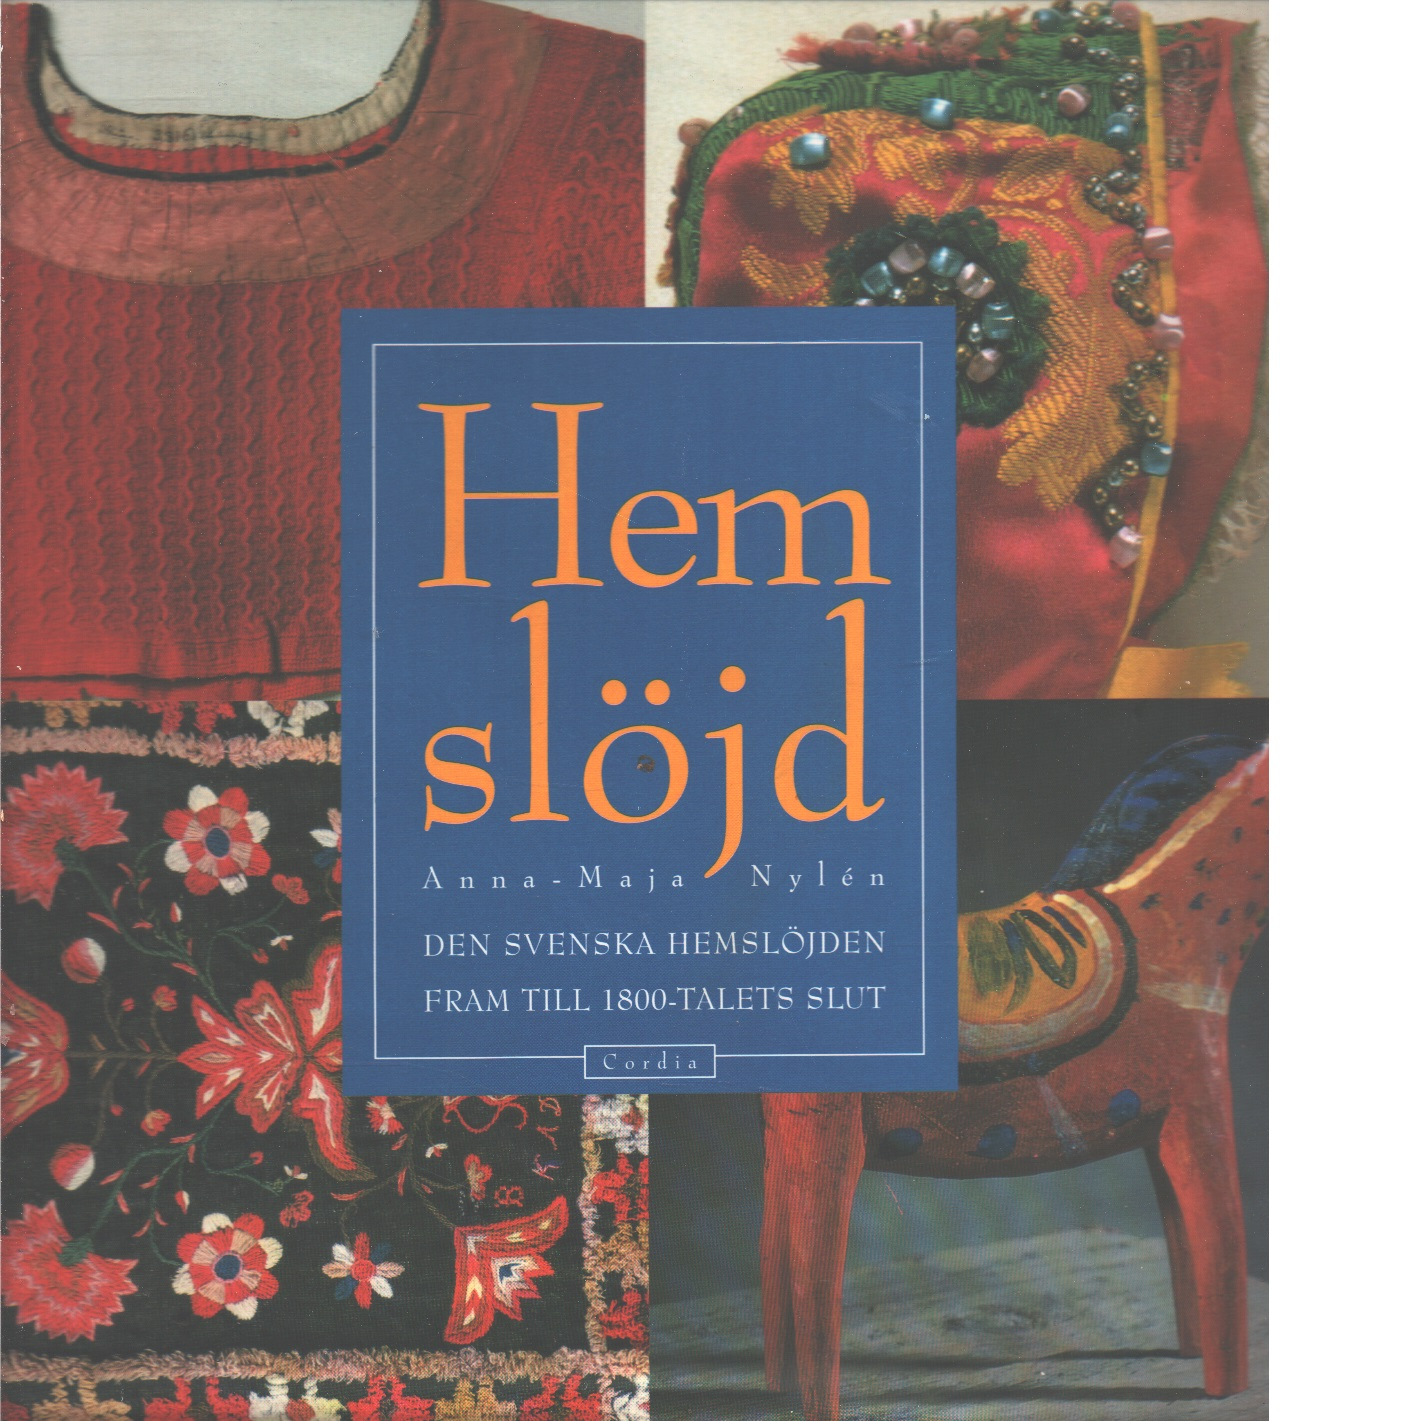 Hemslöjd - Nylén Anna-Maja